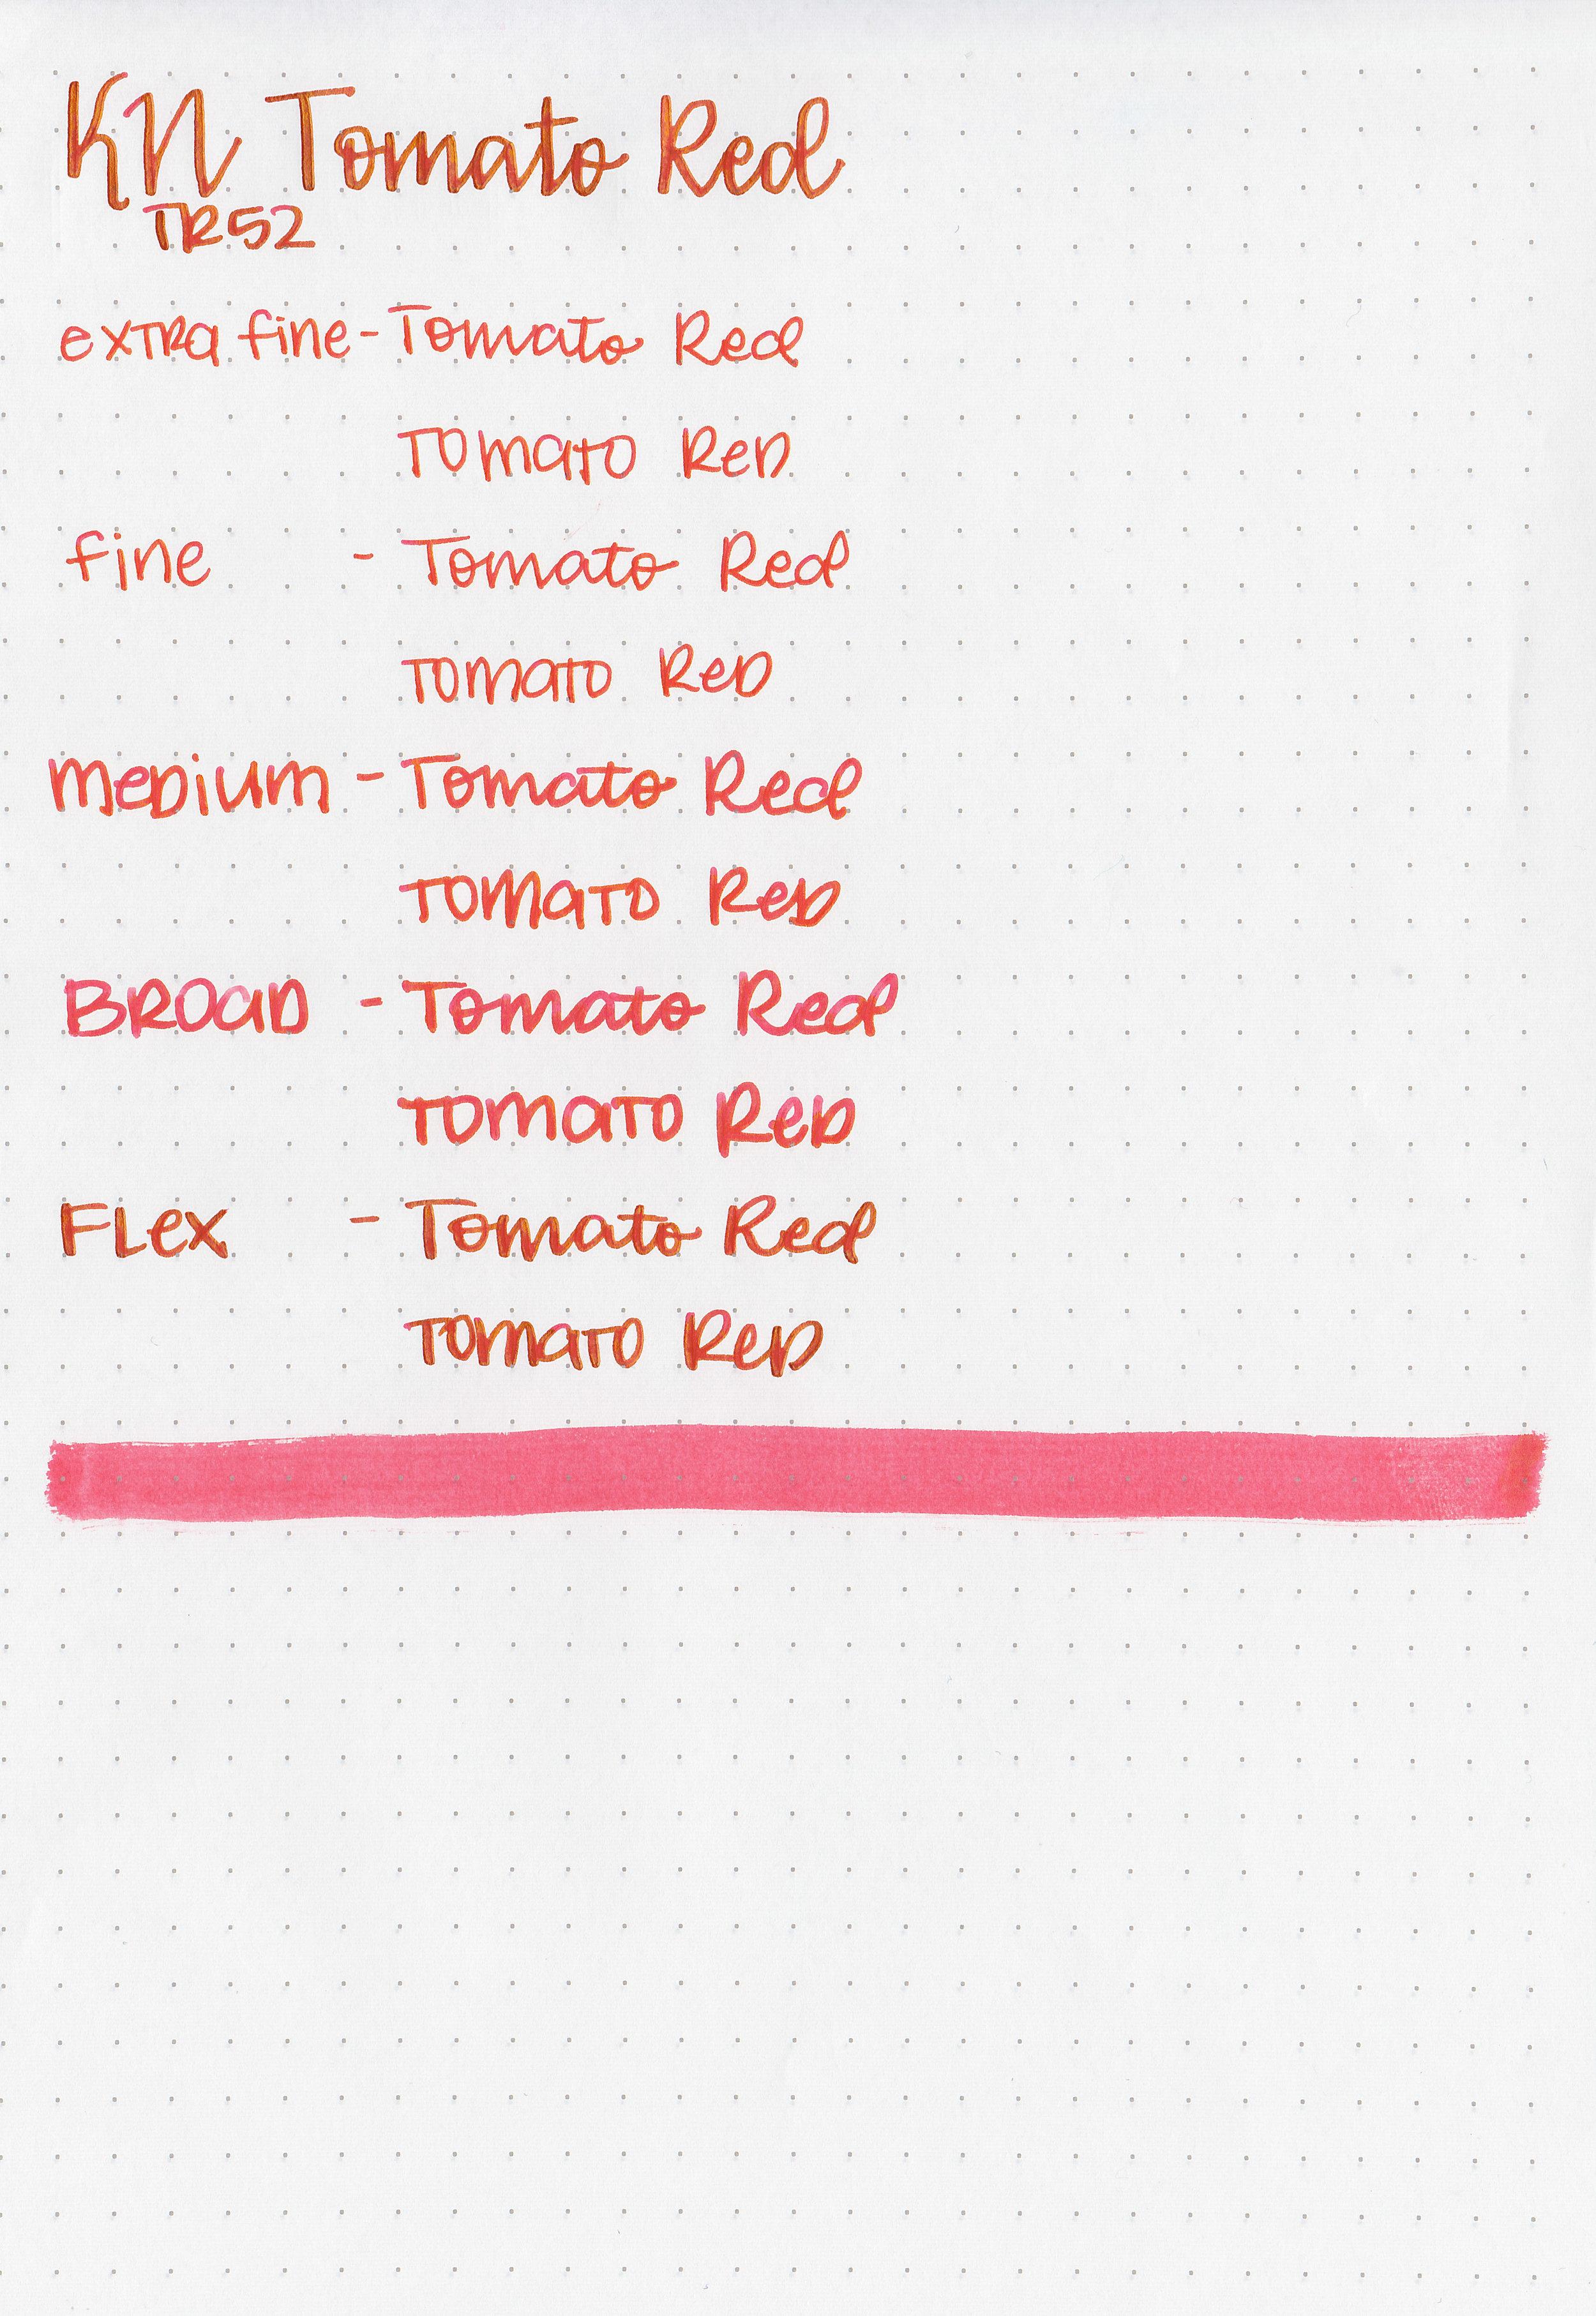 kn-tomato-red-5.jpg